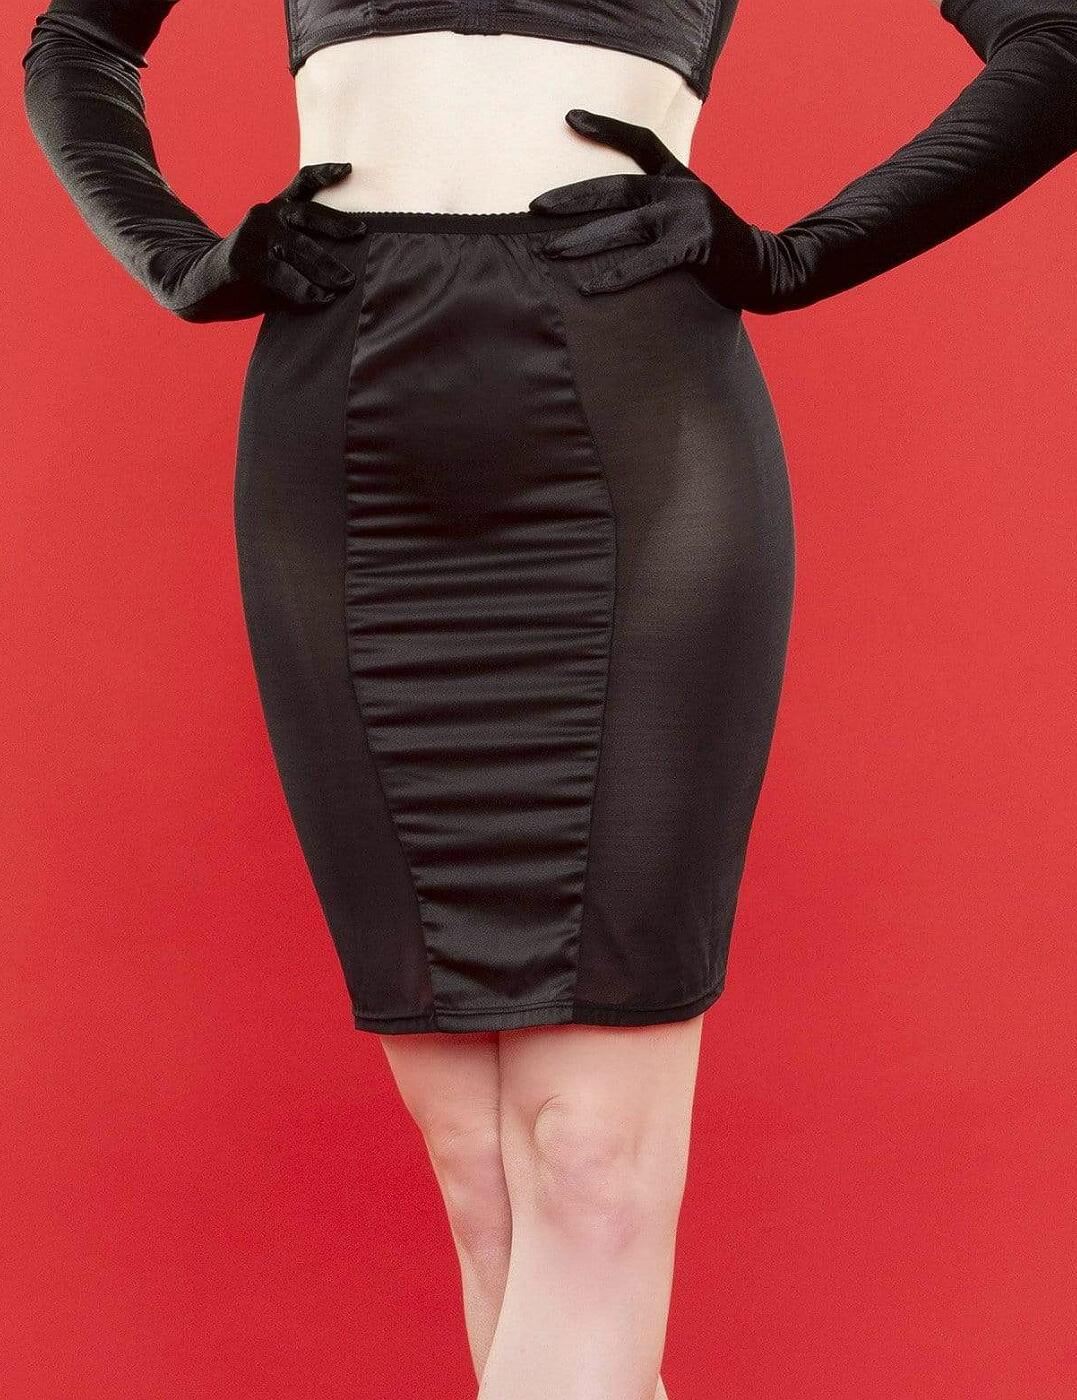 BP031T Playful Promises Bettie Page Tassle Skirt - BP031T Black